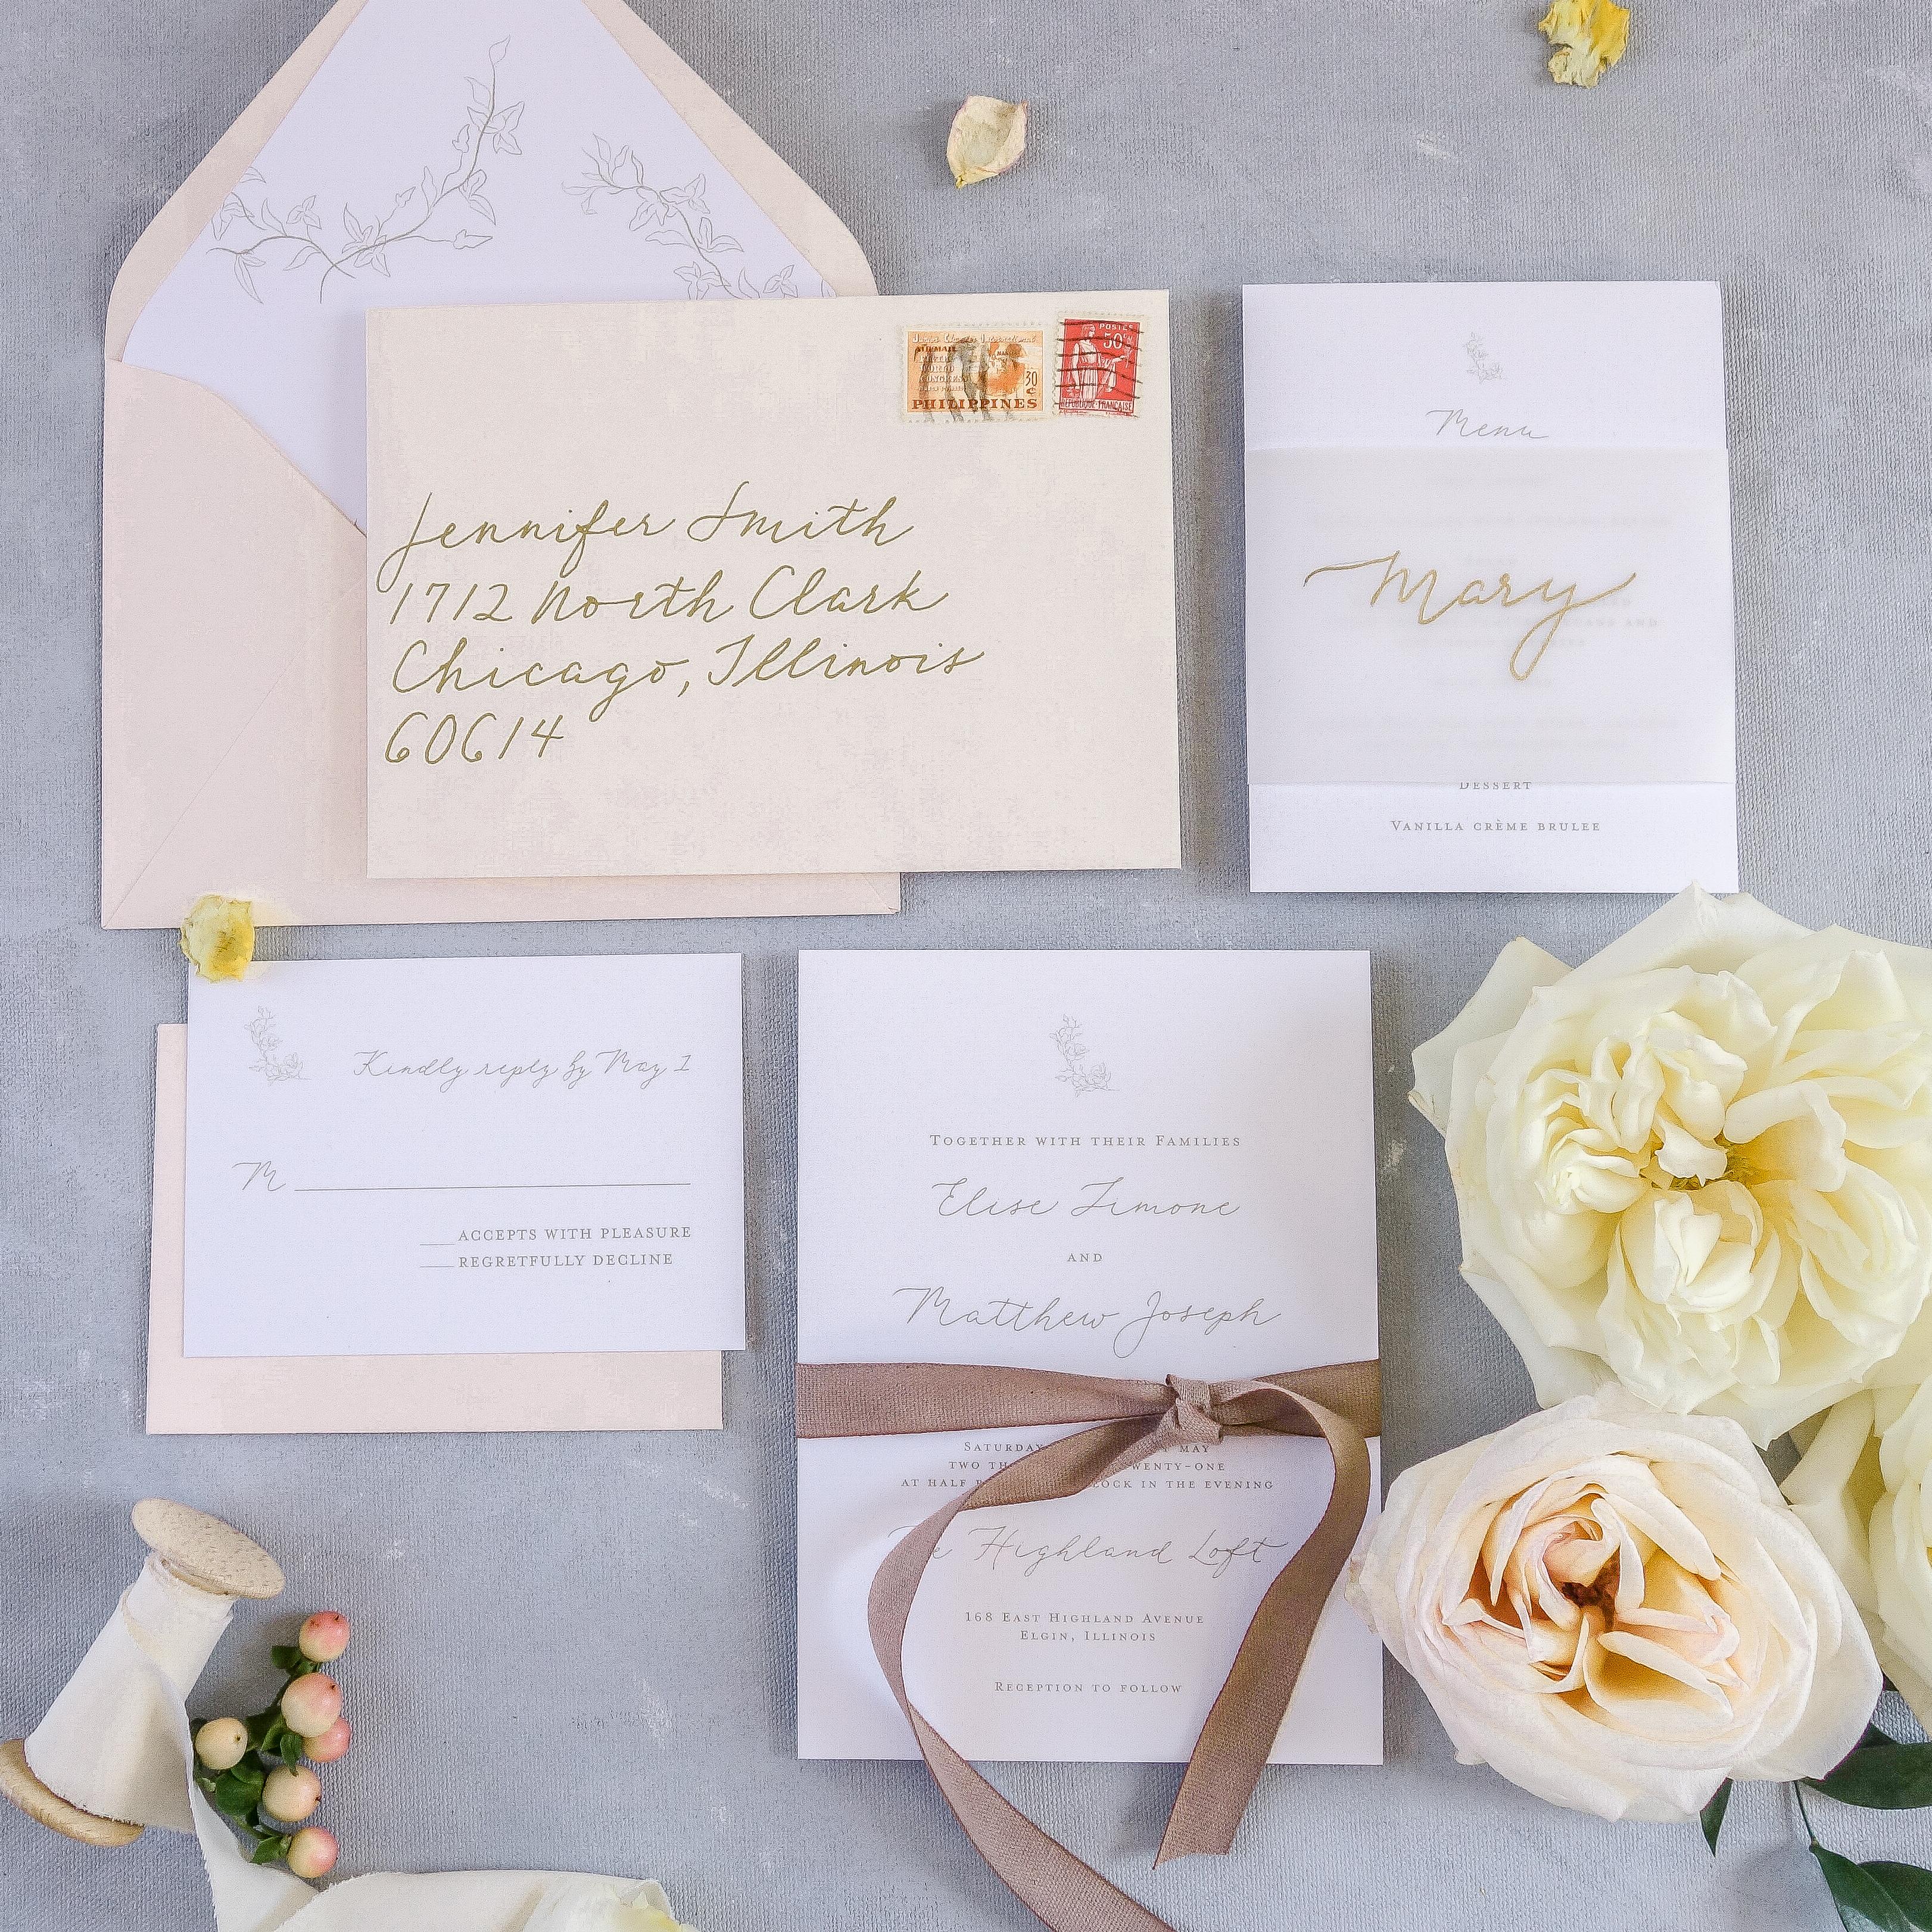 Chicago Calligrapher Chicago Wedding Invitations (7)